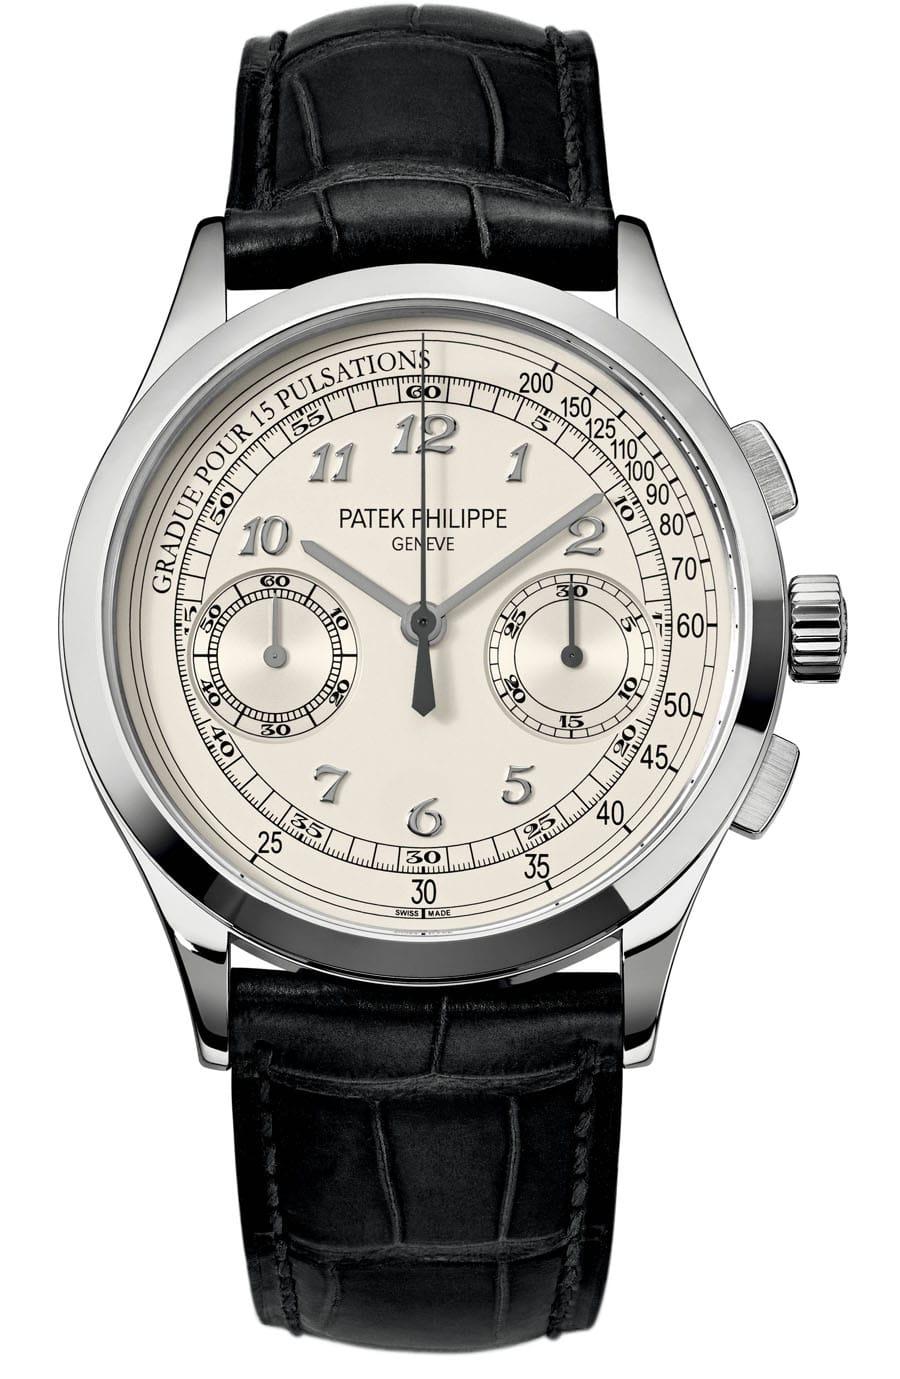 Patek Philippe: Manufaktur-Chronograph Referenz 5170G